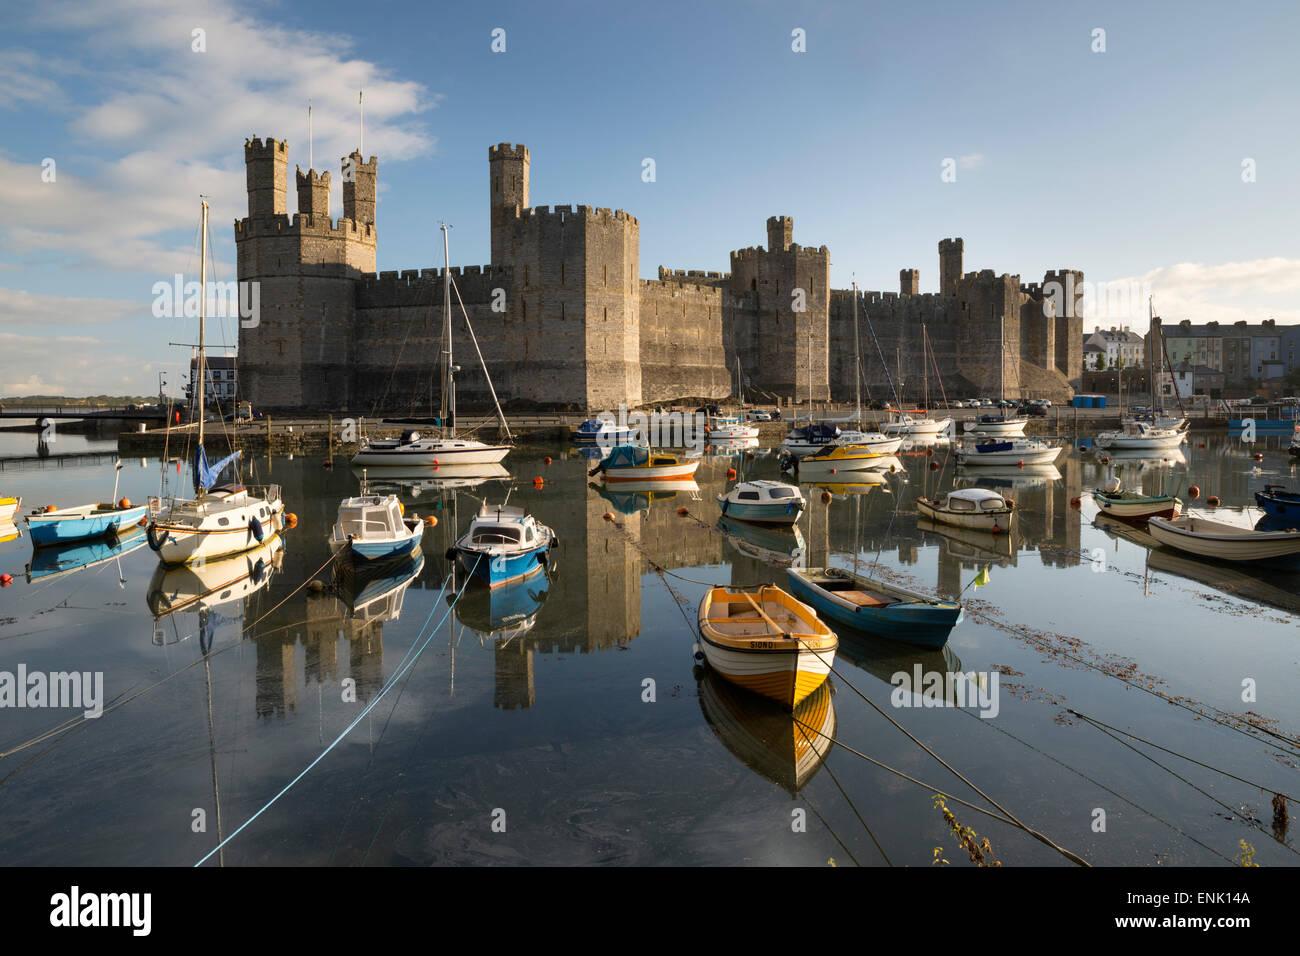 Caernarfon Castle,UNESCO World Heritage Site, on the River Seiont, Caernarfon, Snowdonia, Gwynedd, Wales, United - Stock Image